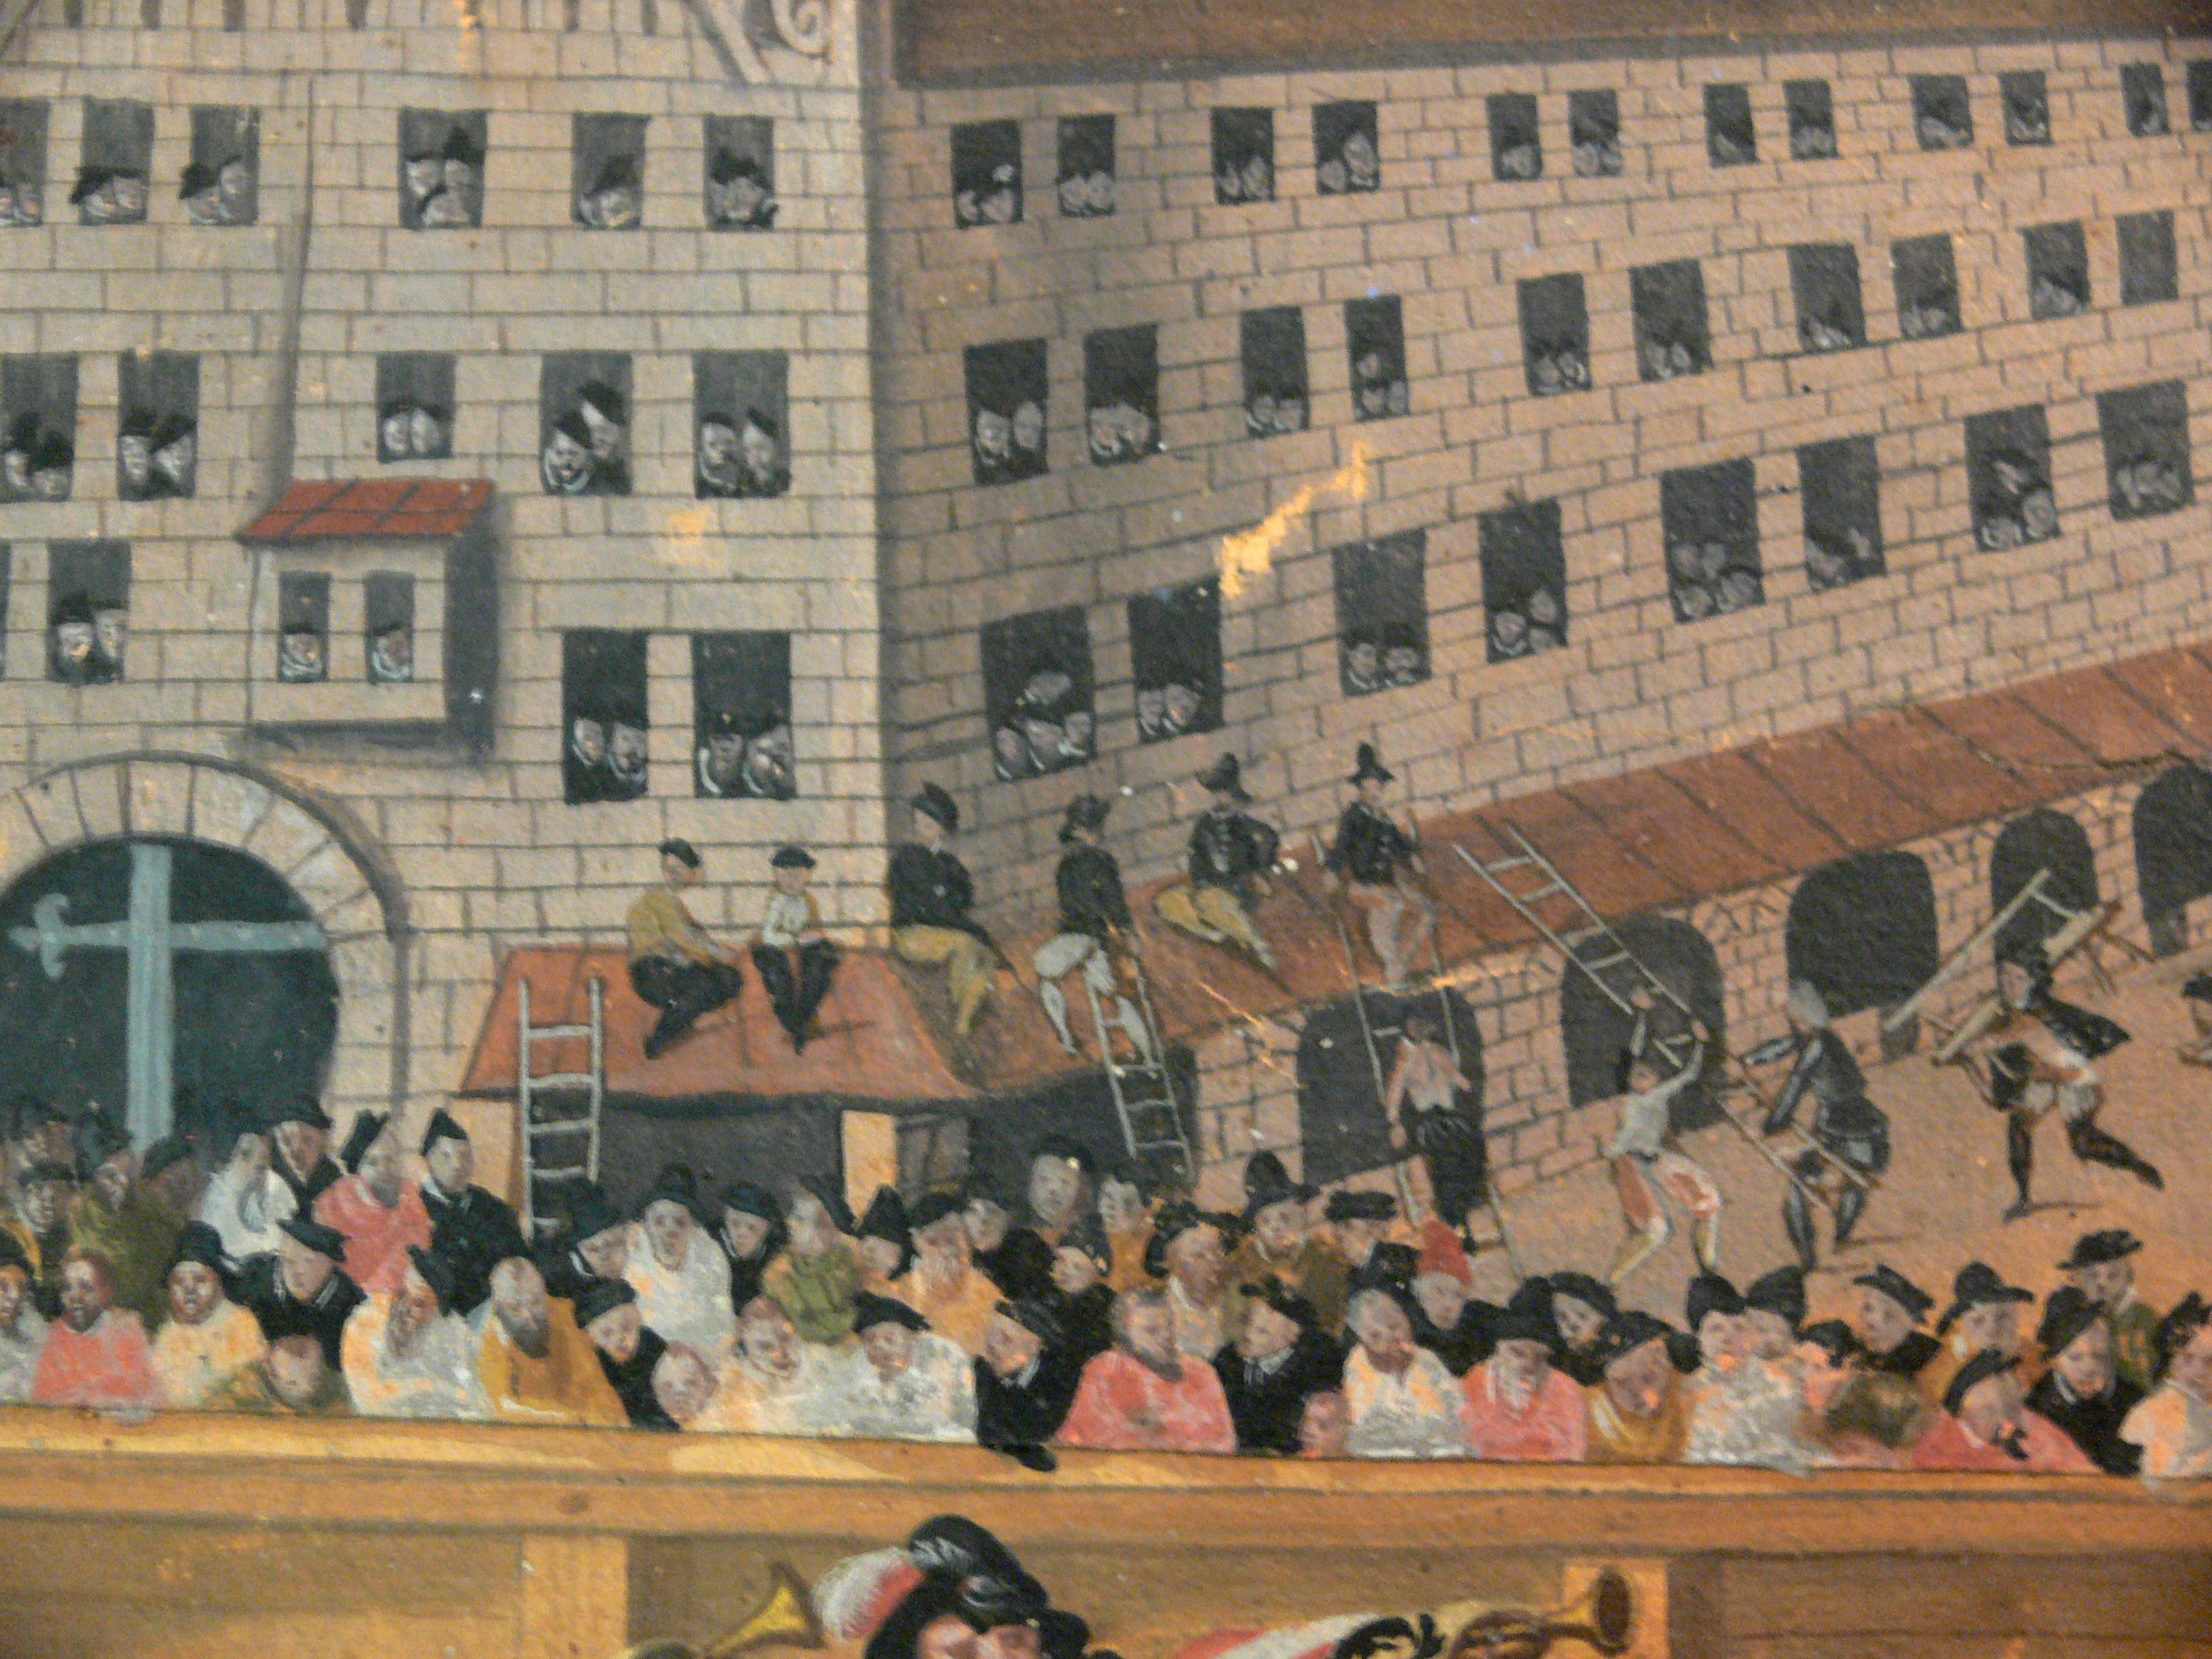 File:Gesellen-Stechen 1561 detail09.jpg